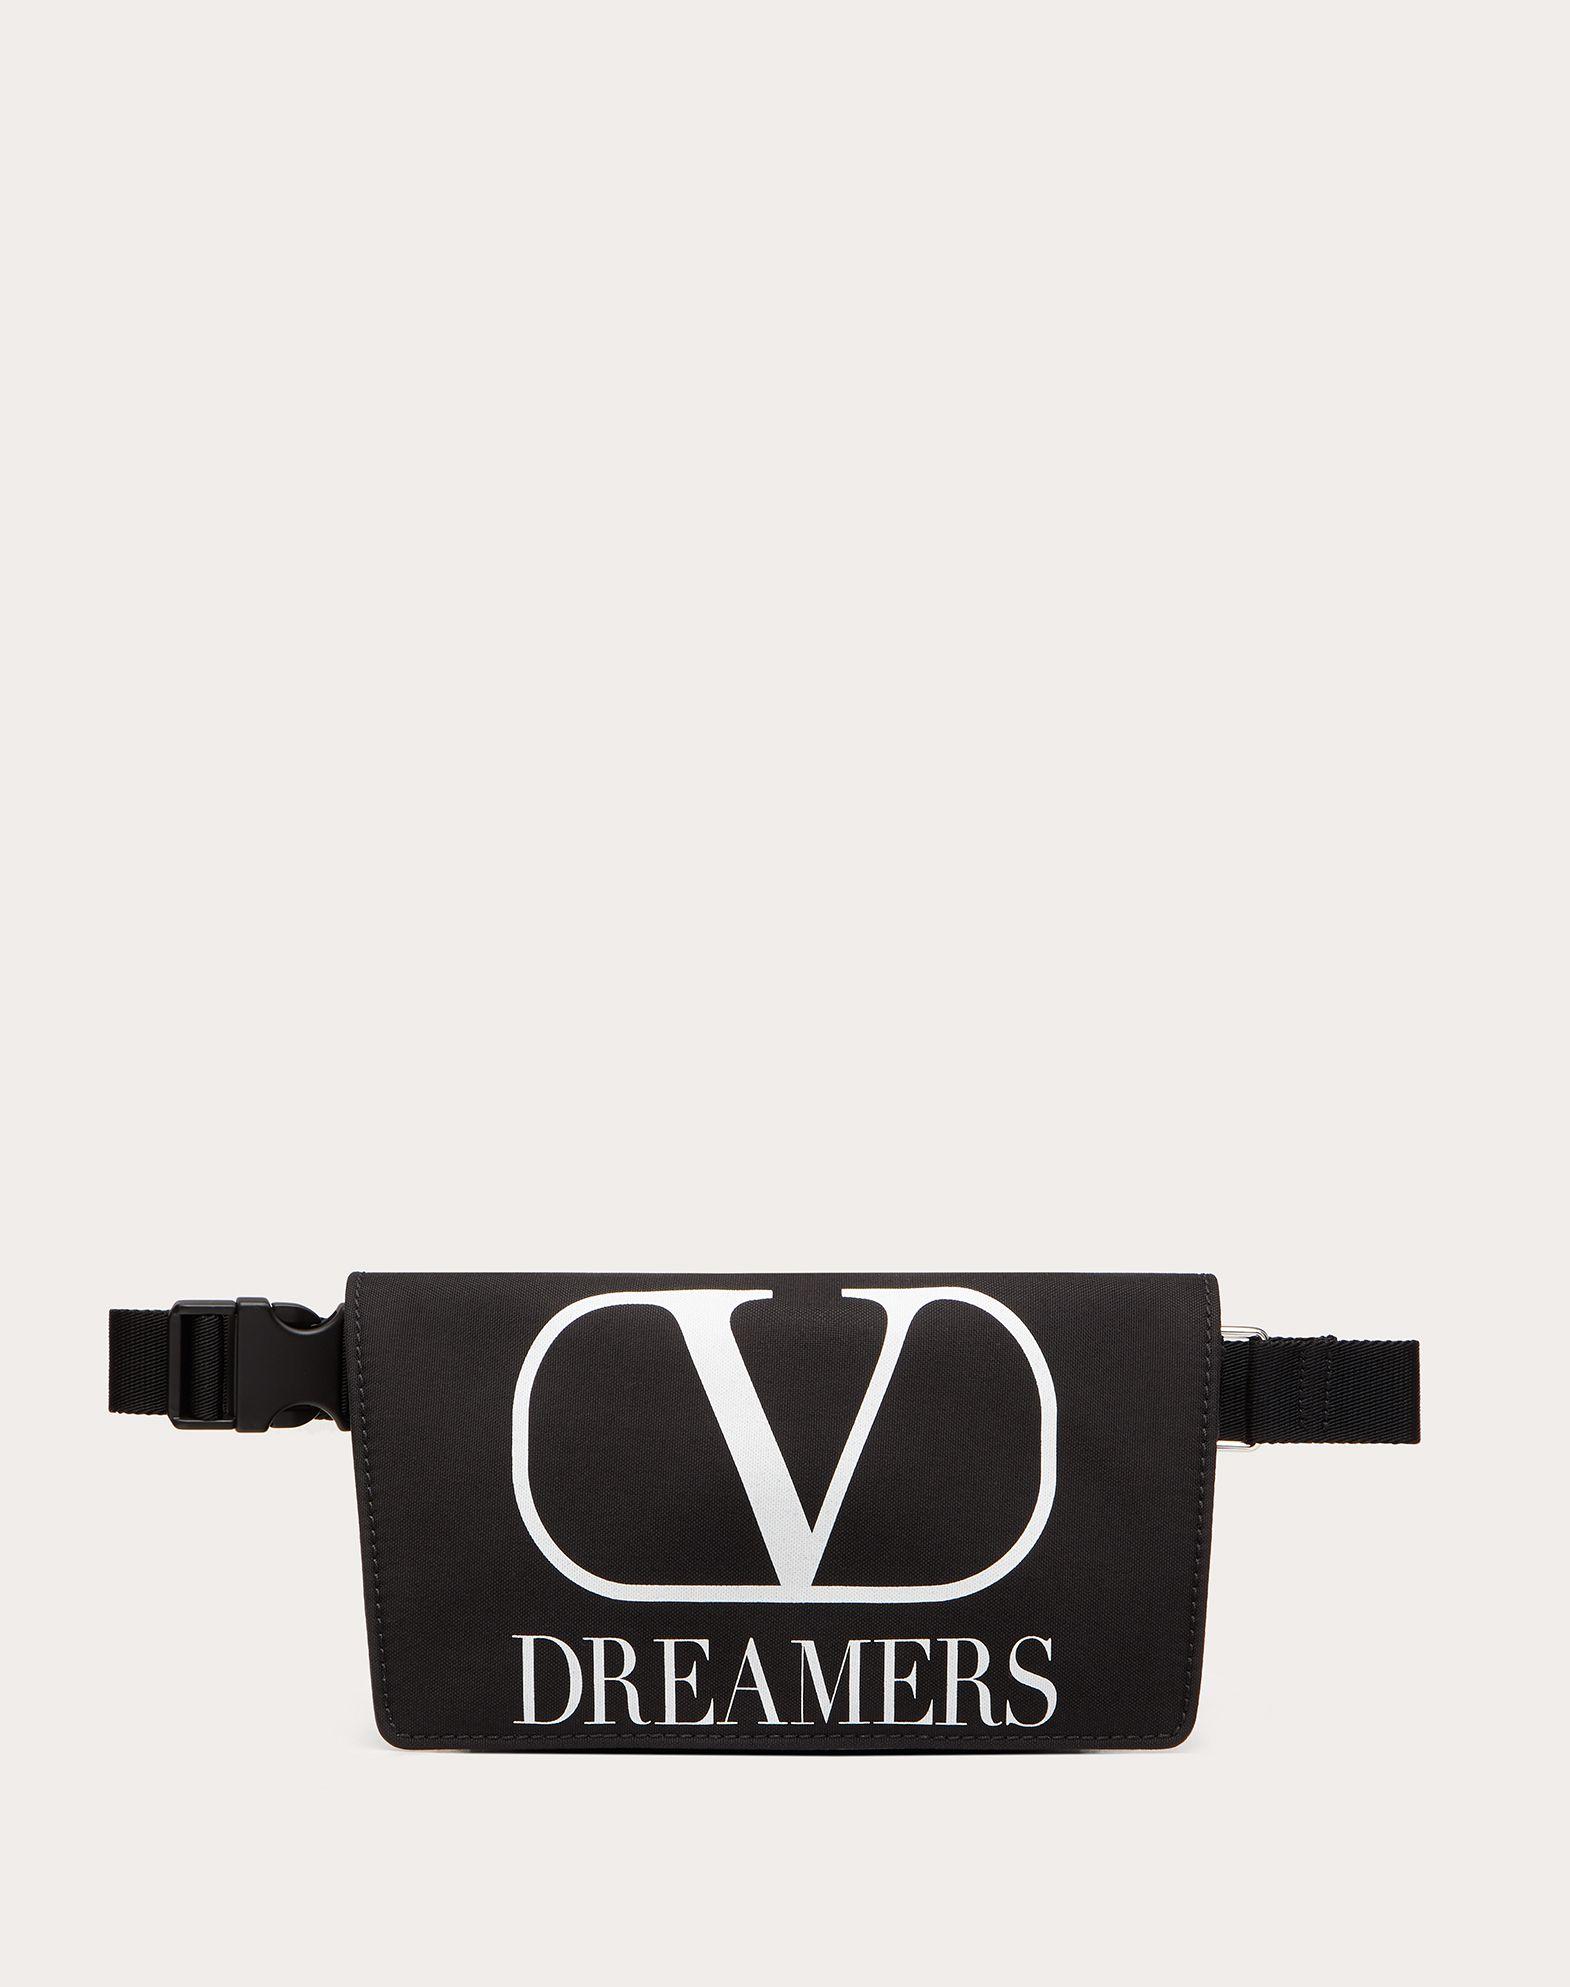 Gürteltasche VLOGO Dreamers aus Nylon